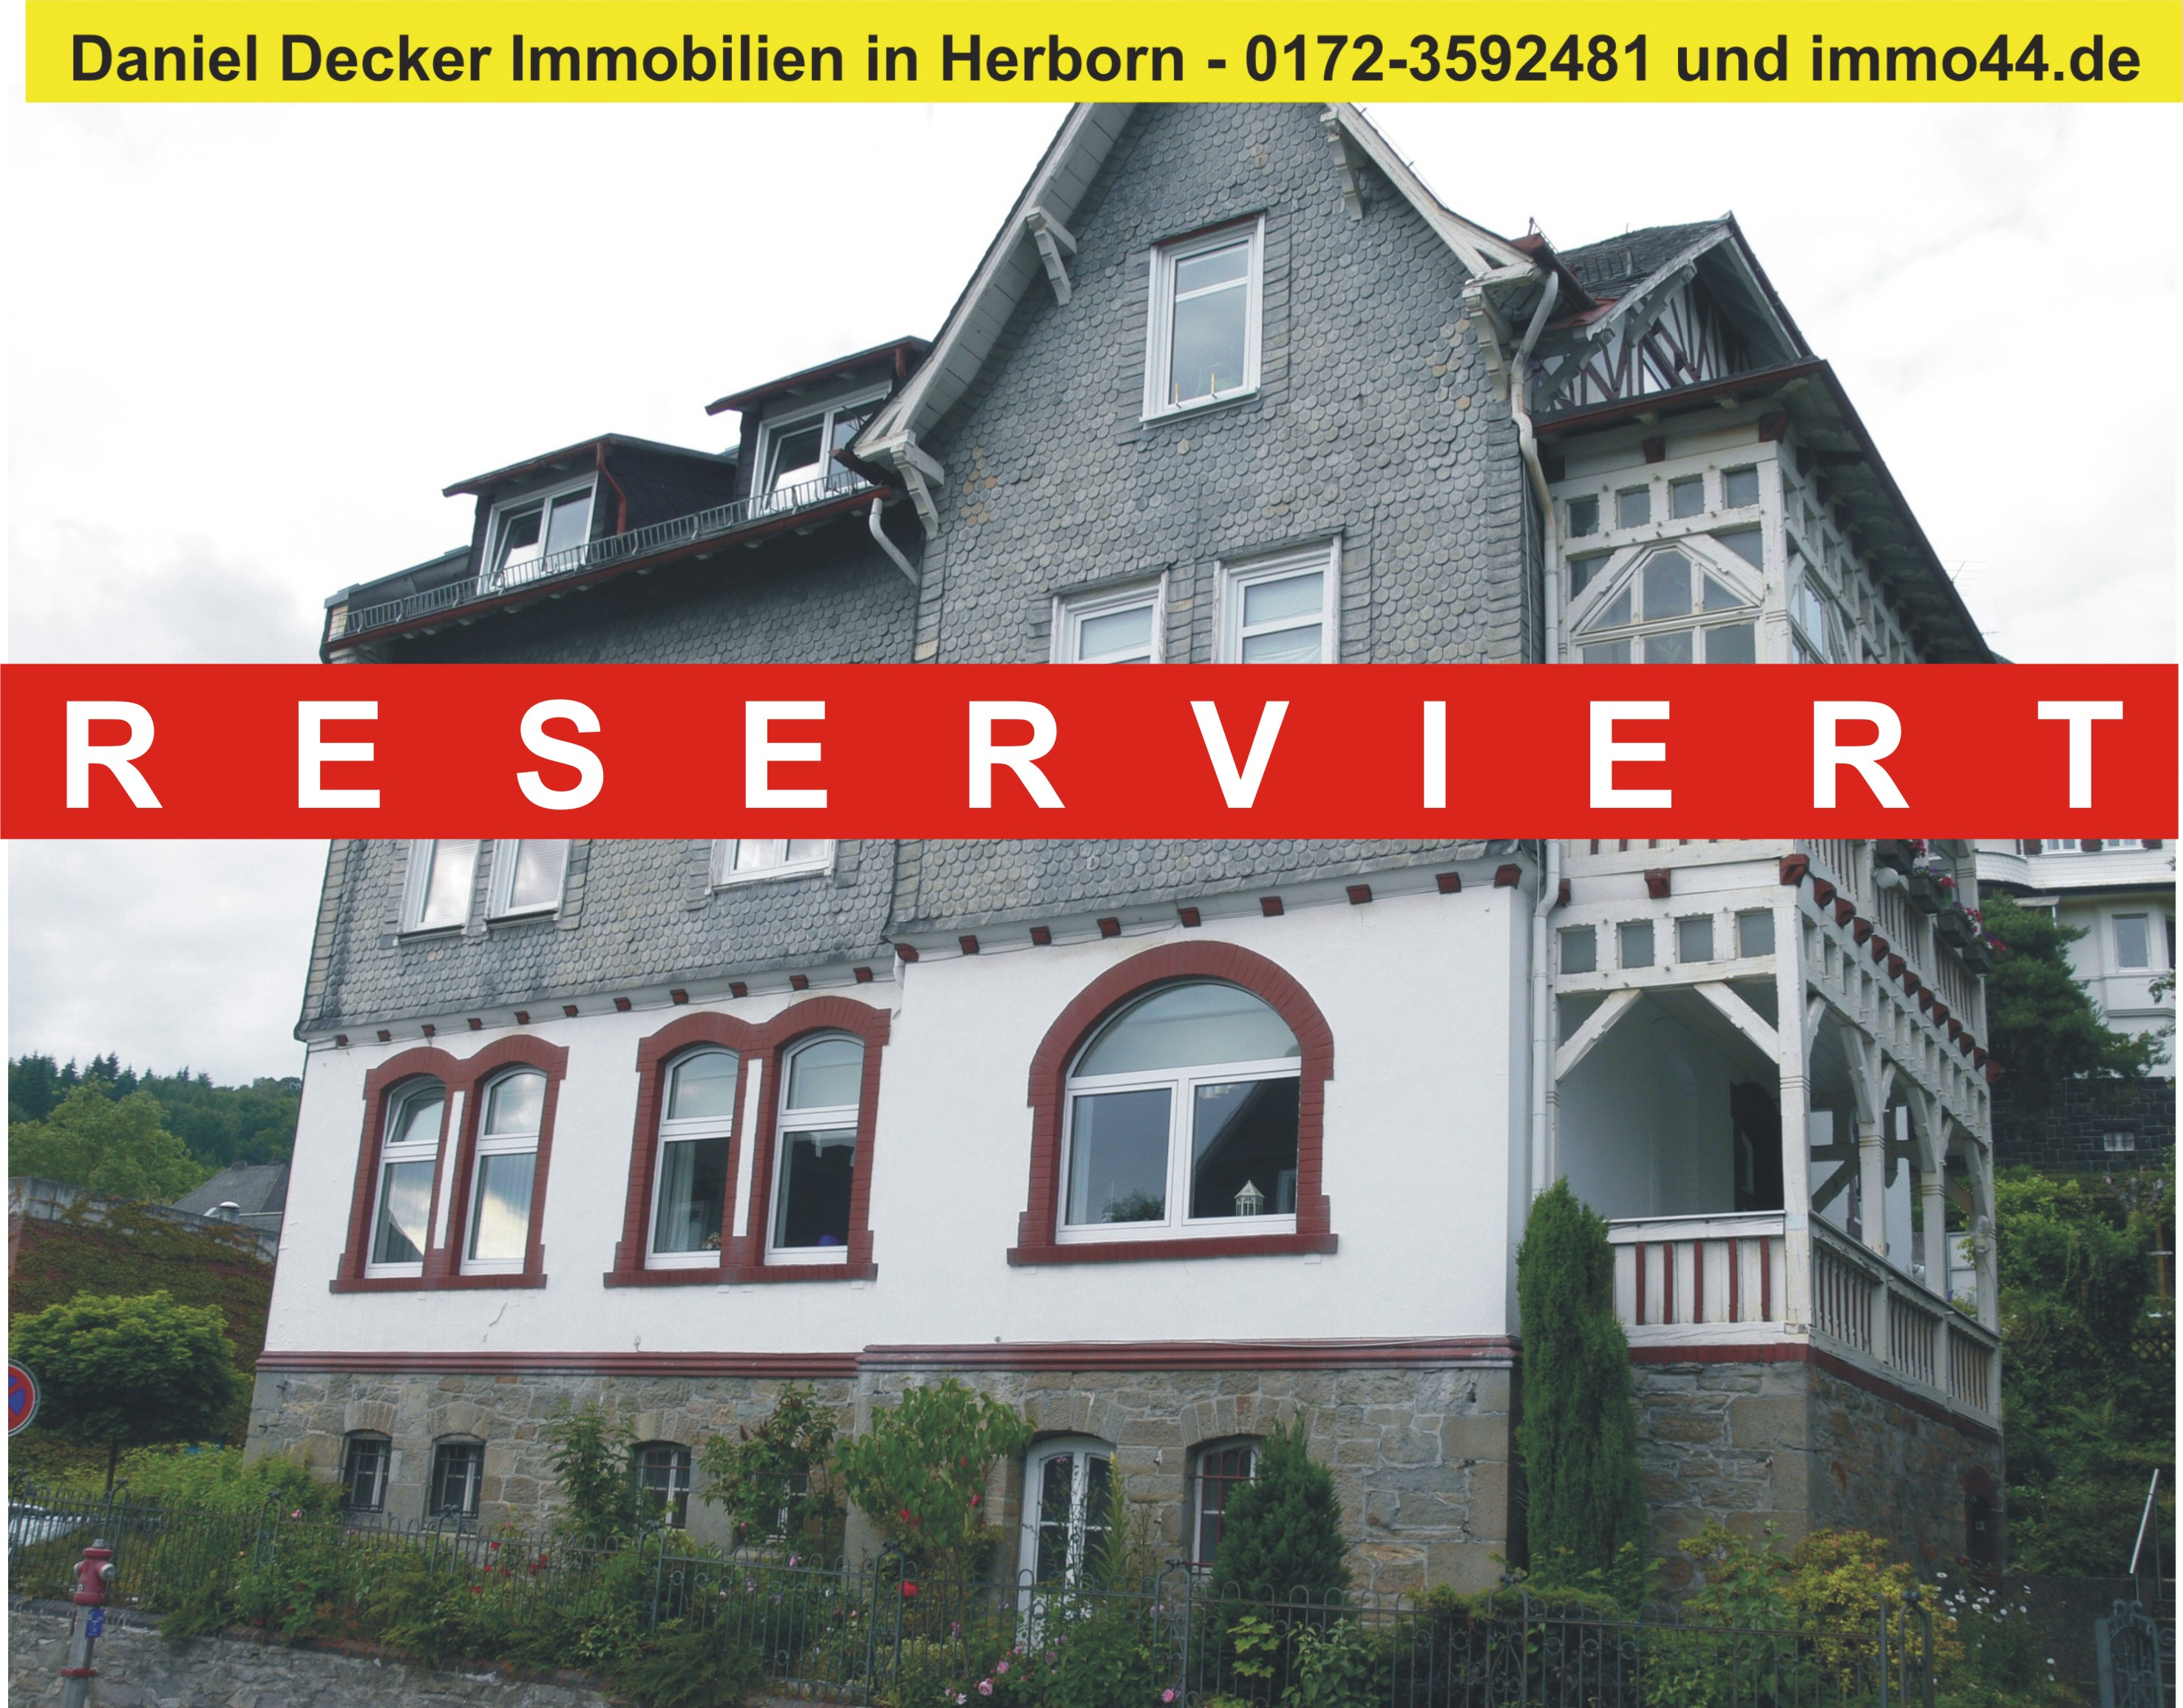 Decker Immobilien 3 familien haus in dillenburg